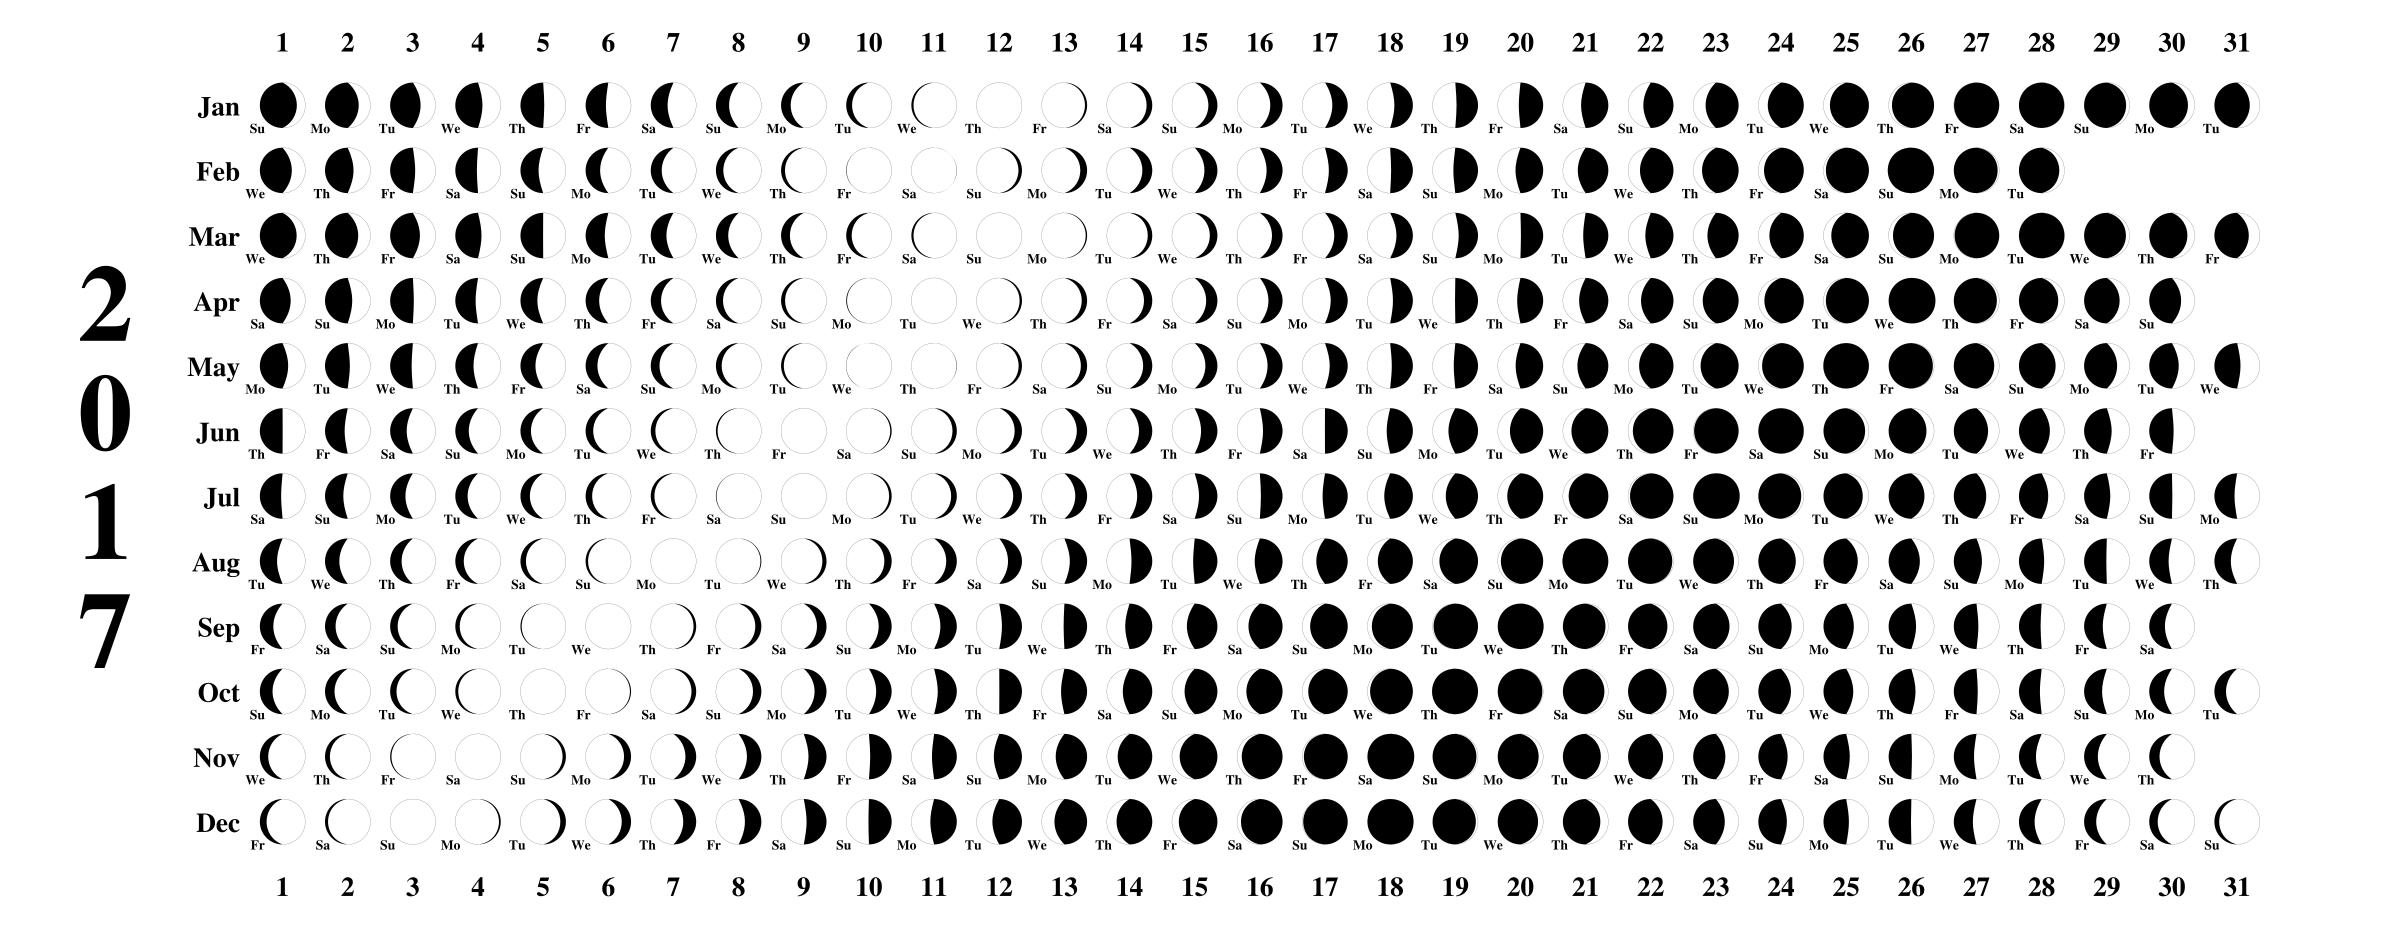 Moon Phases Calendar Lunar Calendar Phases Of The